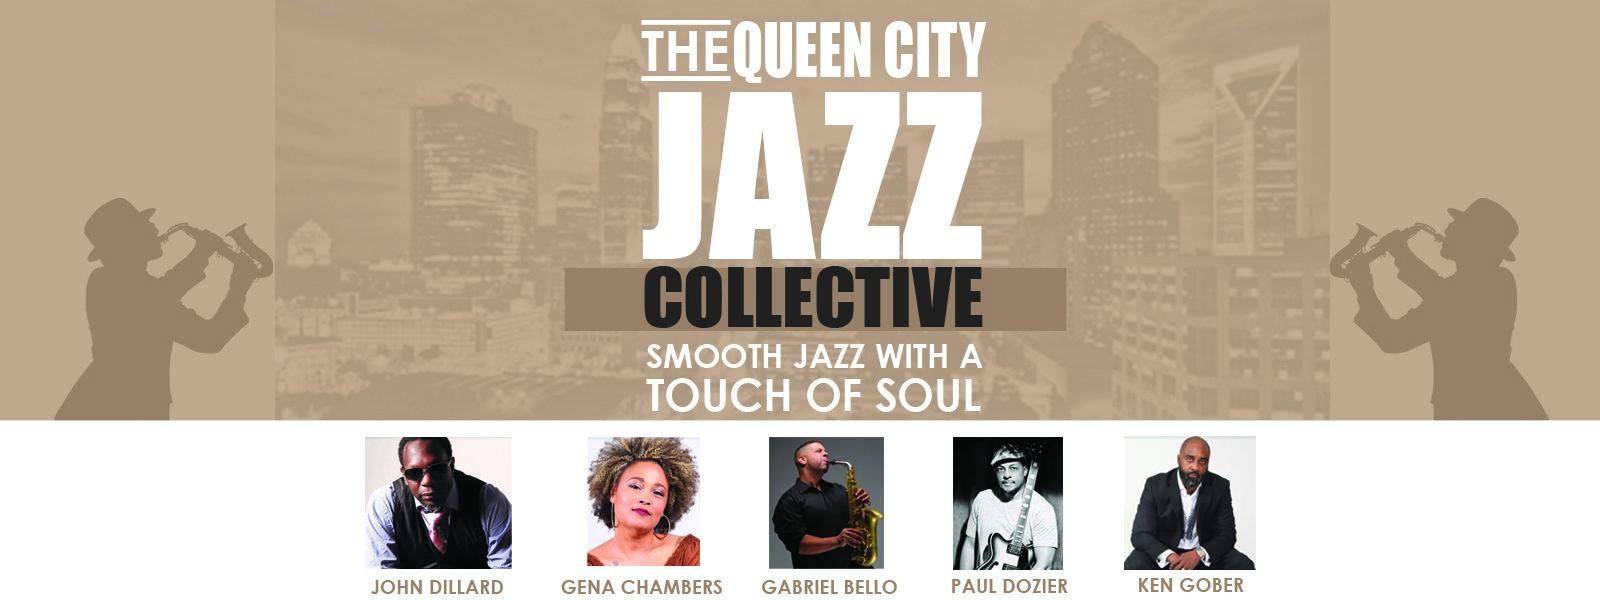 QUEEN CITY JAZZ COLLECTIVE 7:30pm show @ Stage Door Theater